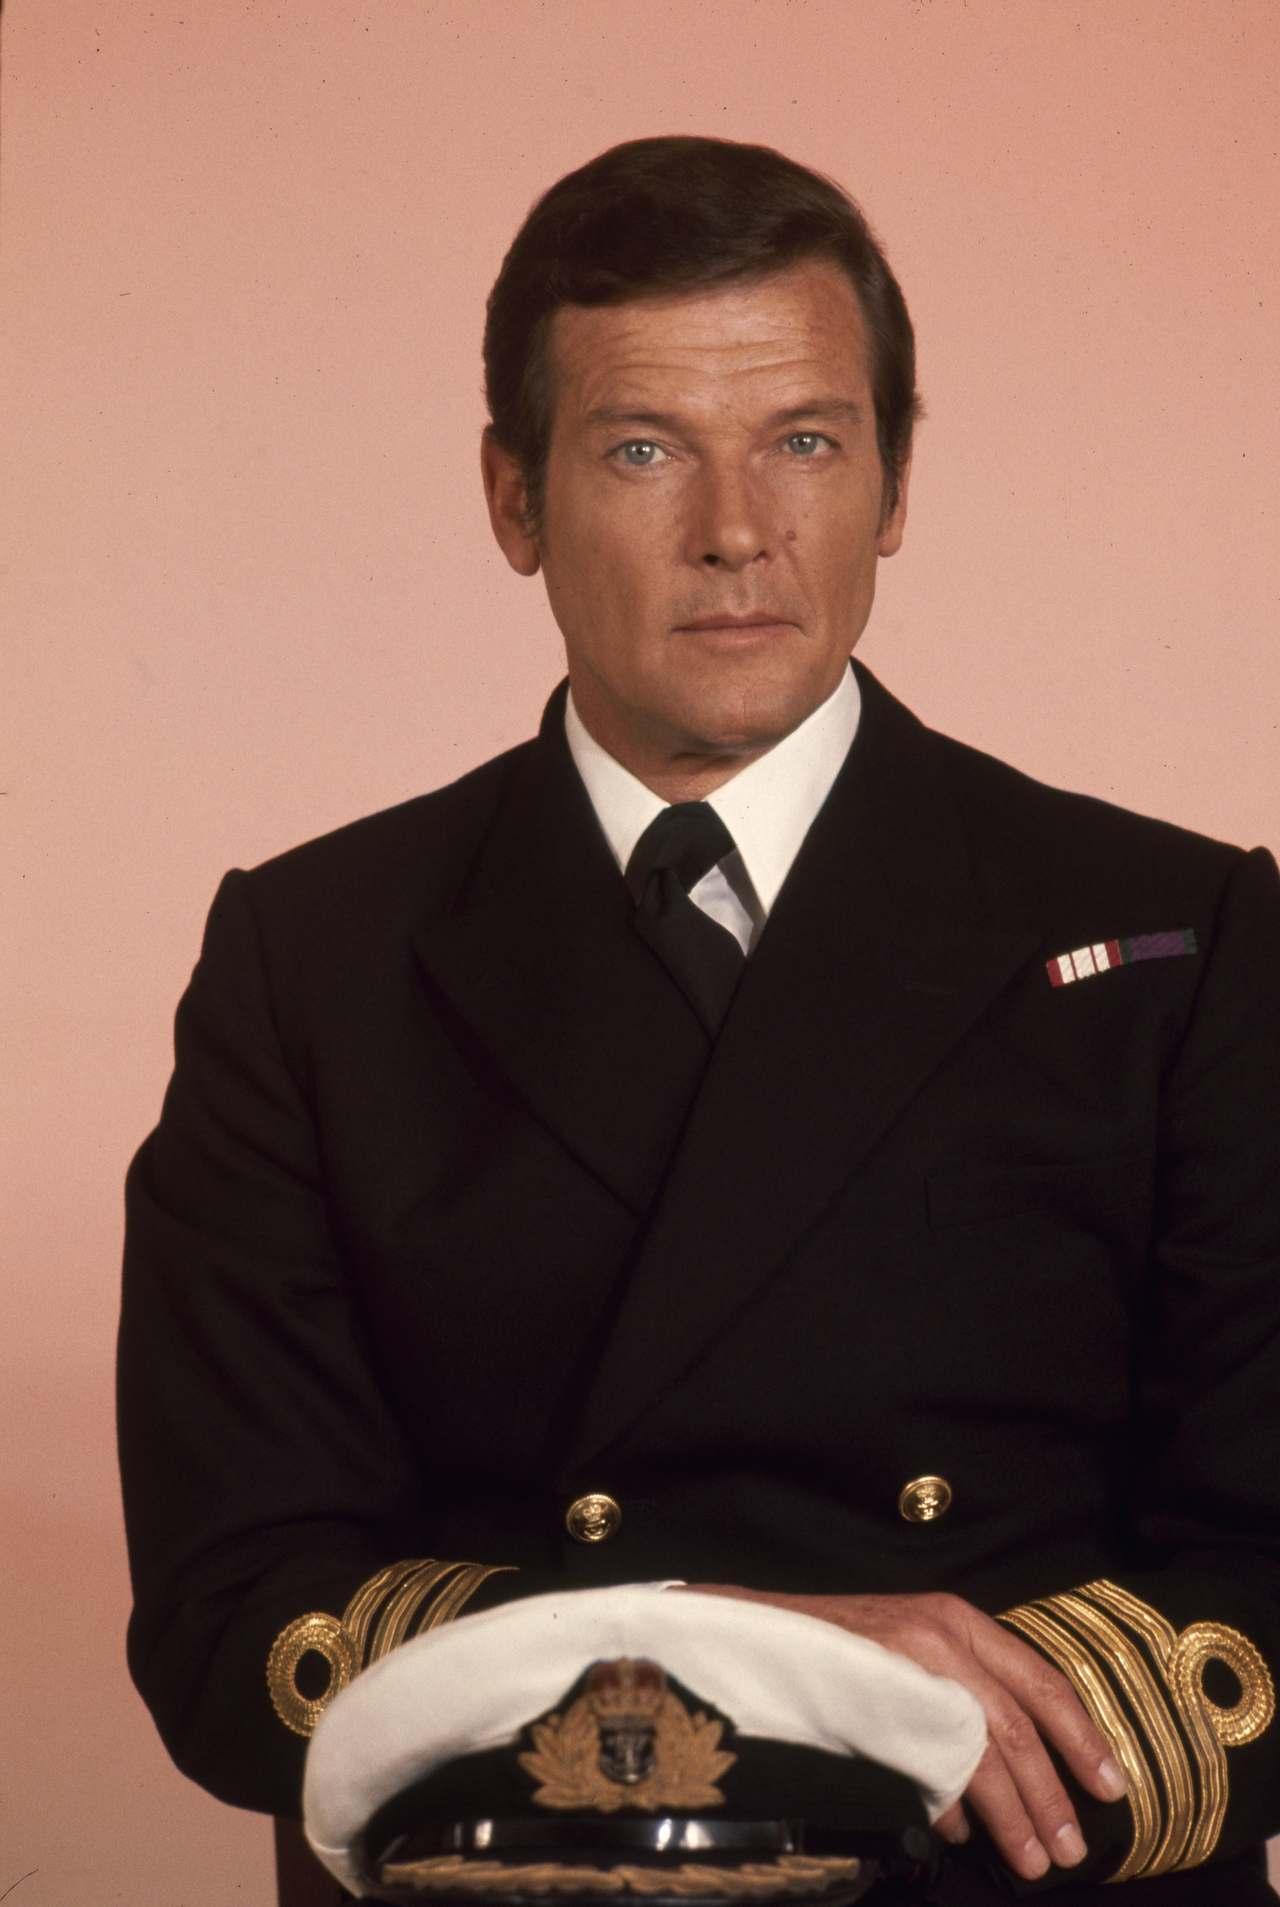 Bond (ROGER MOORE)